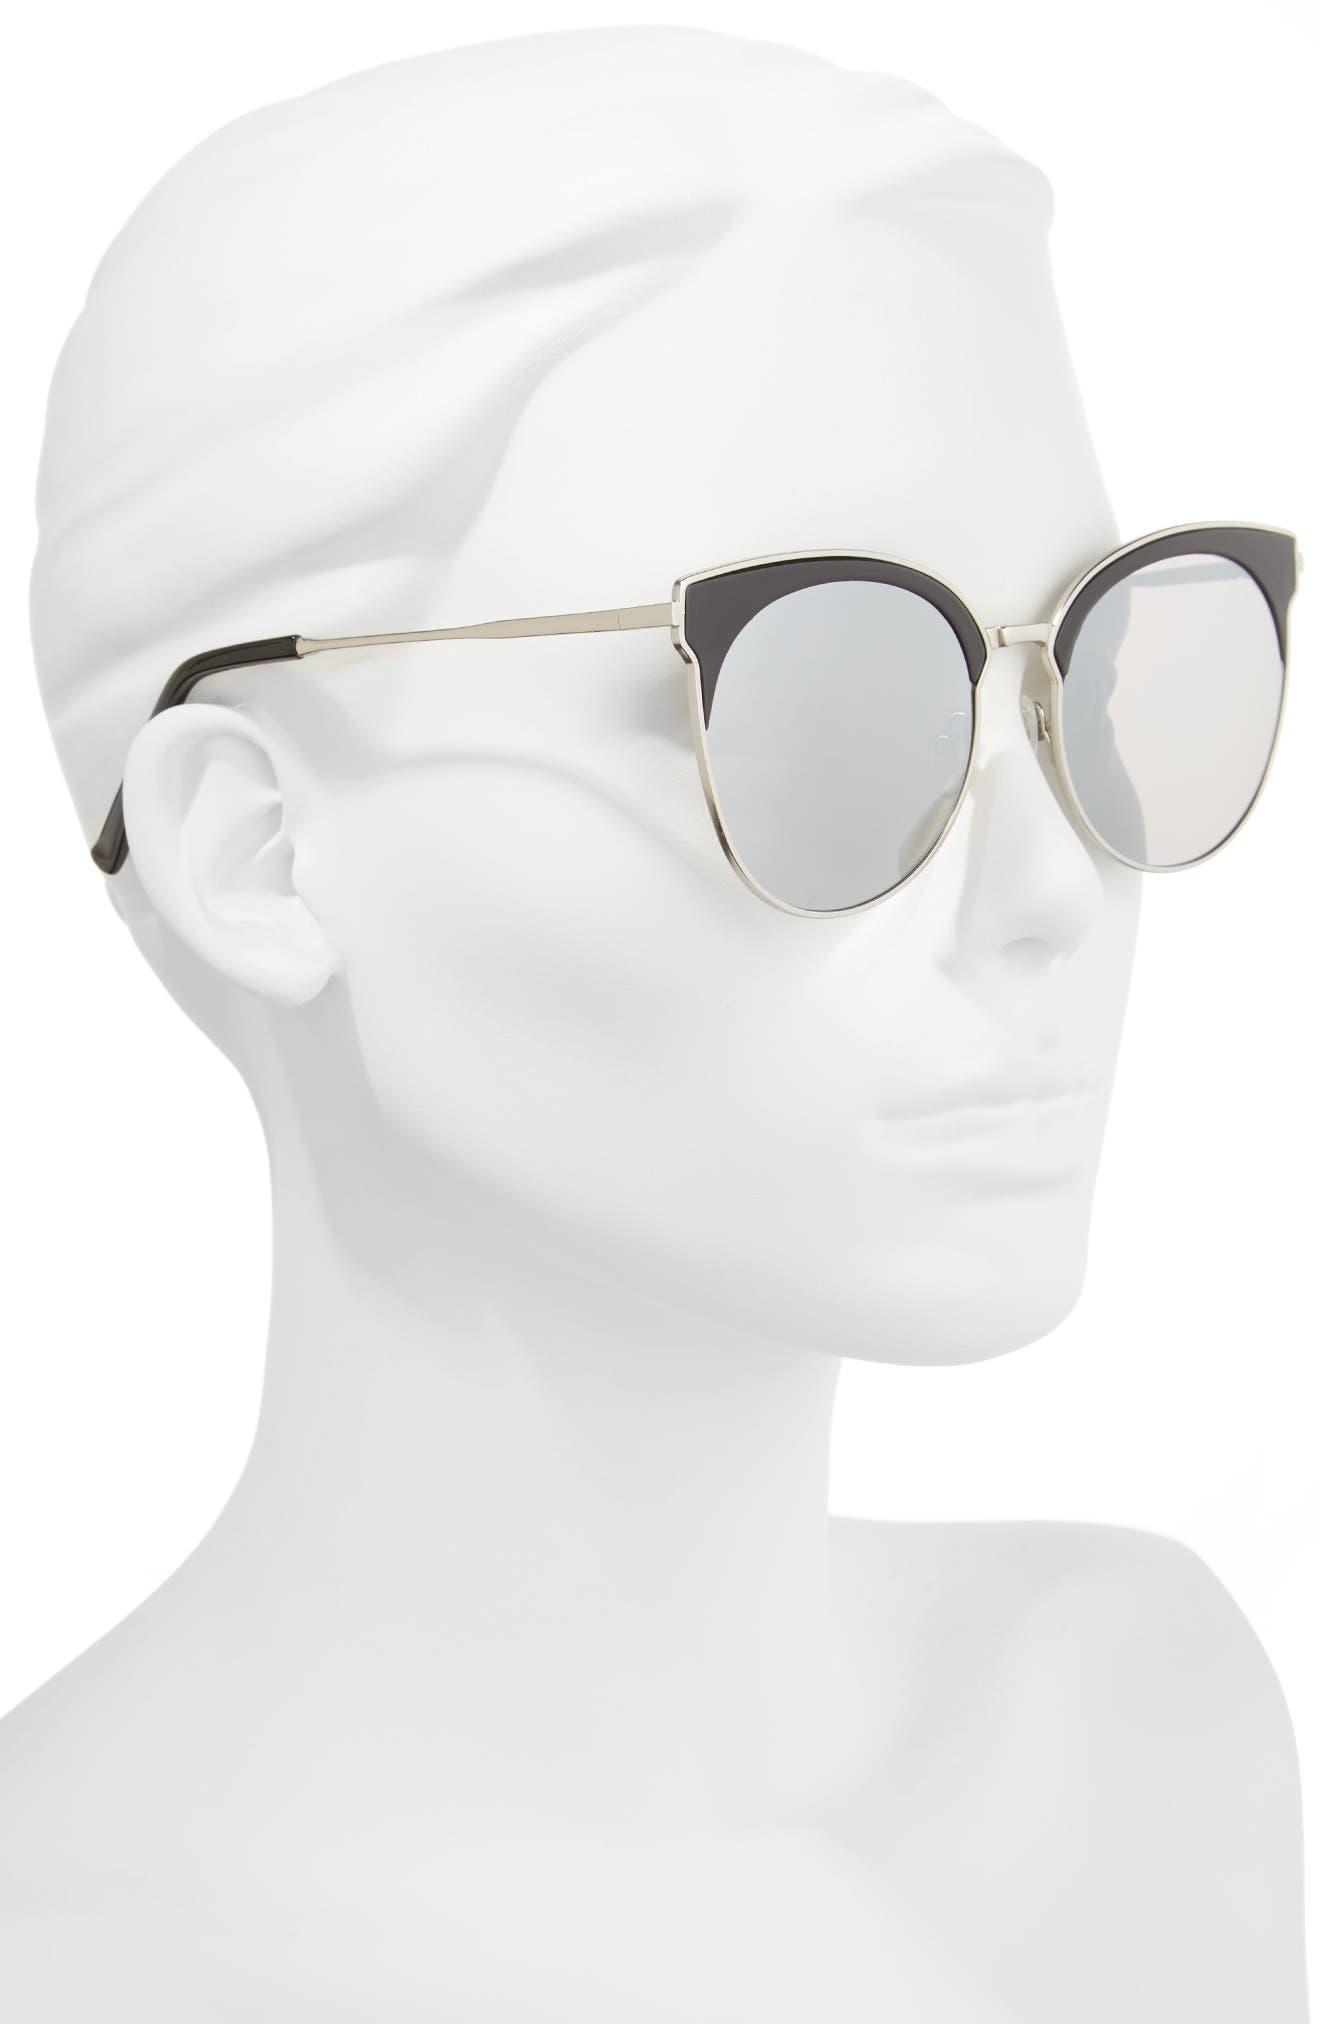 Mia Bella 56mm Sunglasses,                             Alternate thumbnail 2, color,                             001